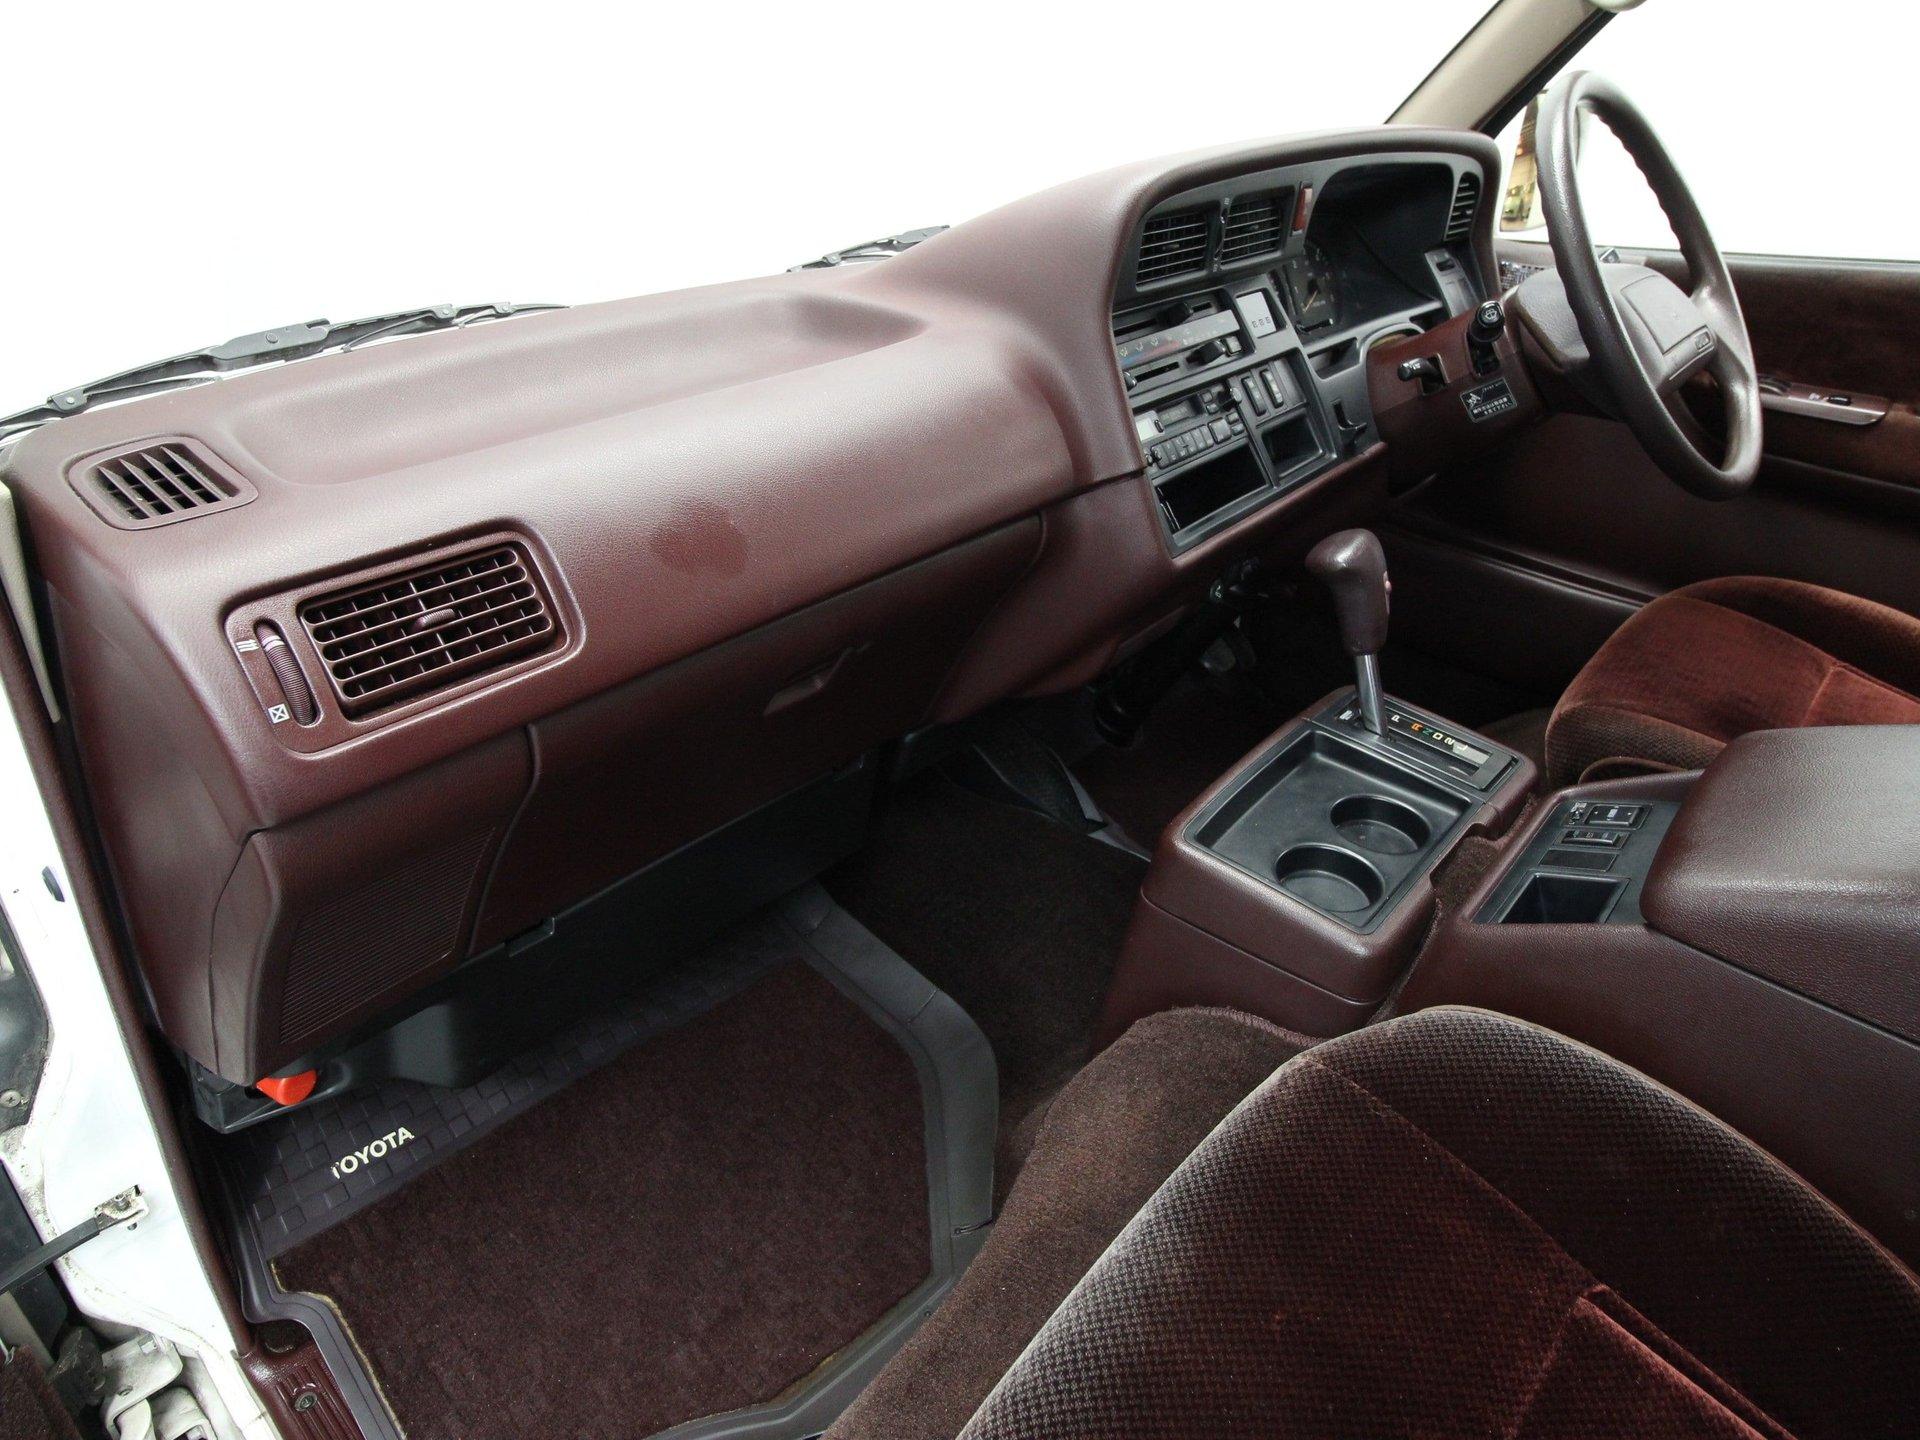 1993 Toyota HiAce